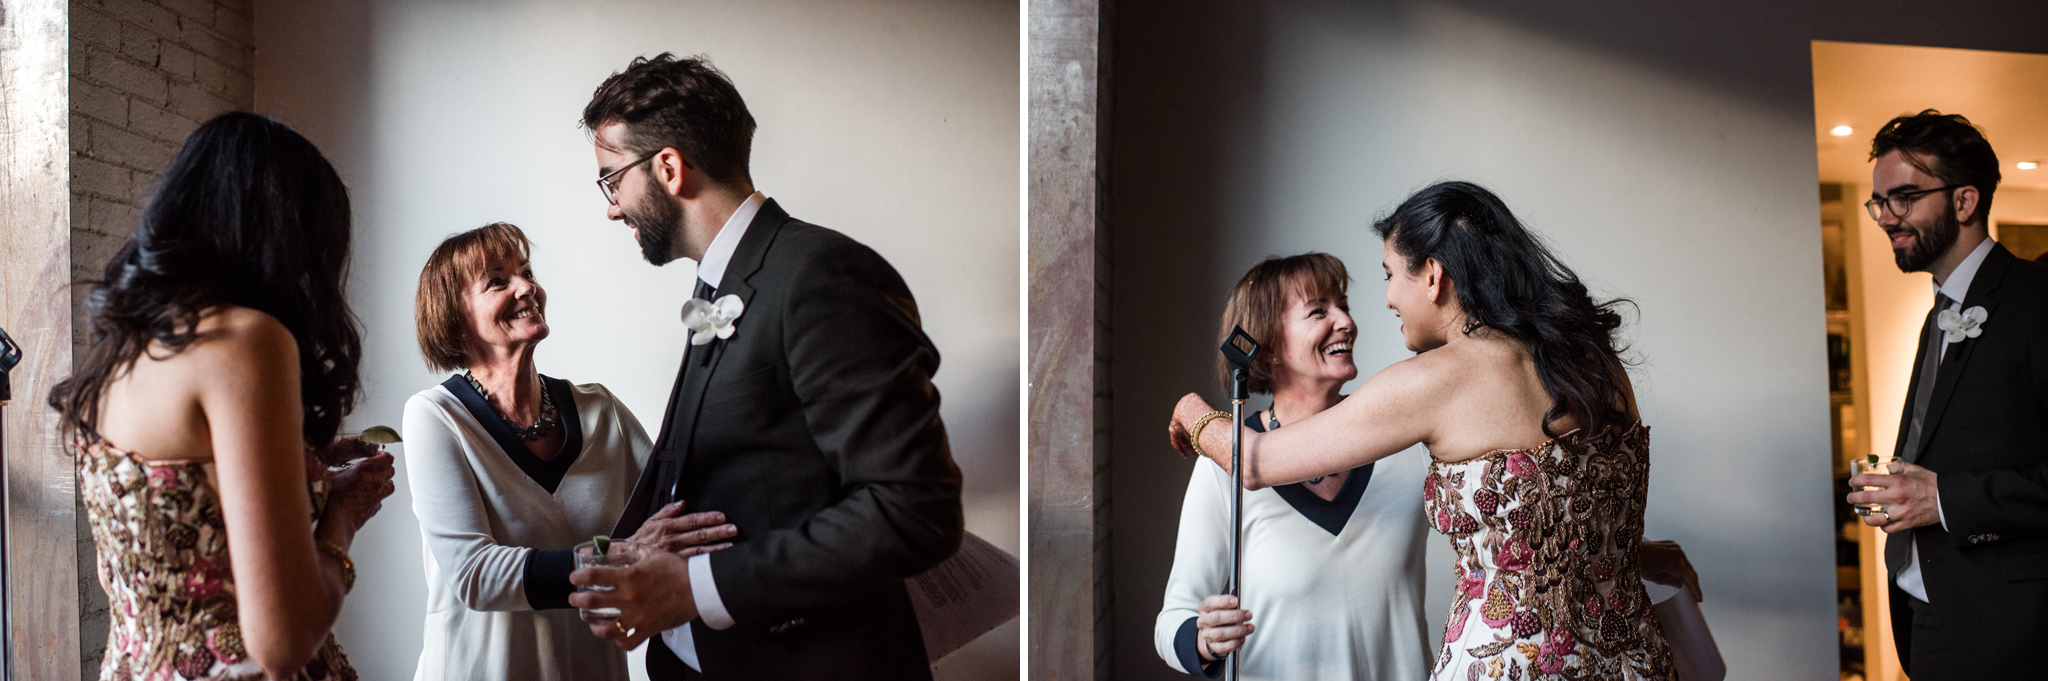 045-groom-mother-speech-reaction-documentary-wedding-hotel-ocho.jpg